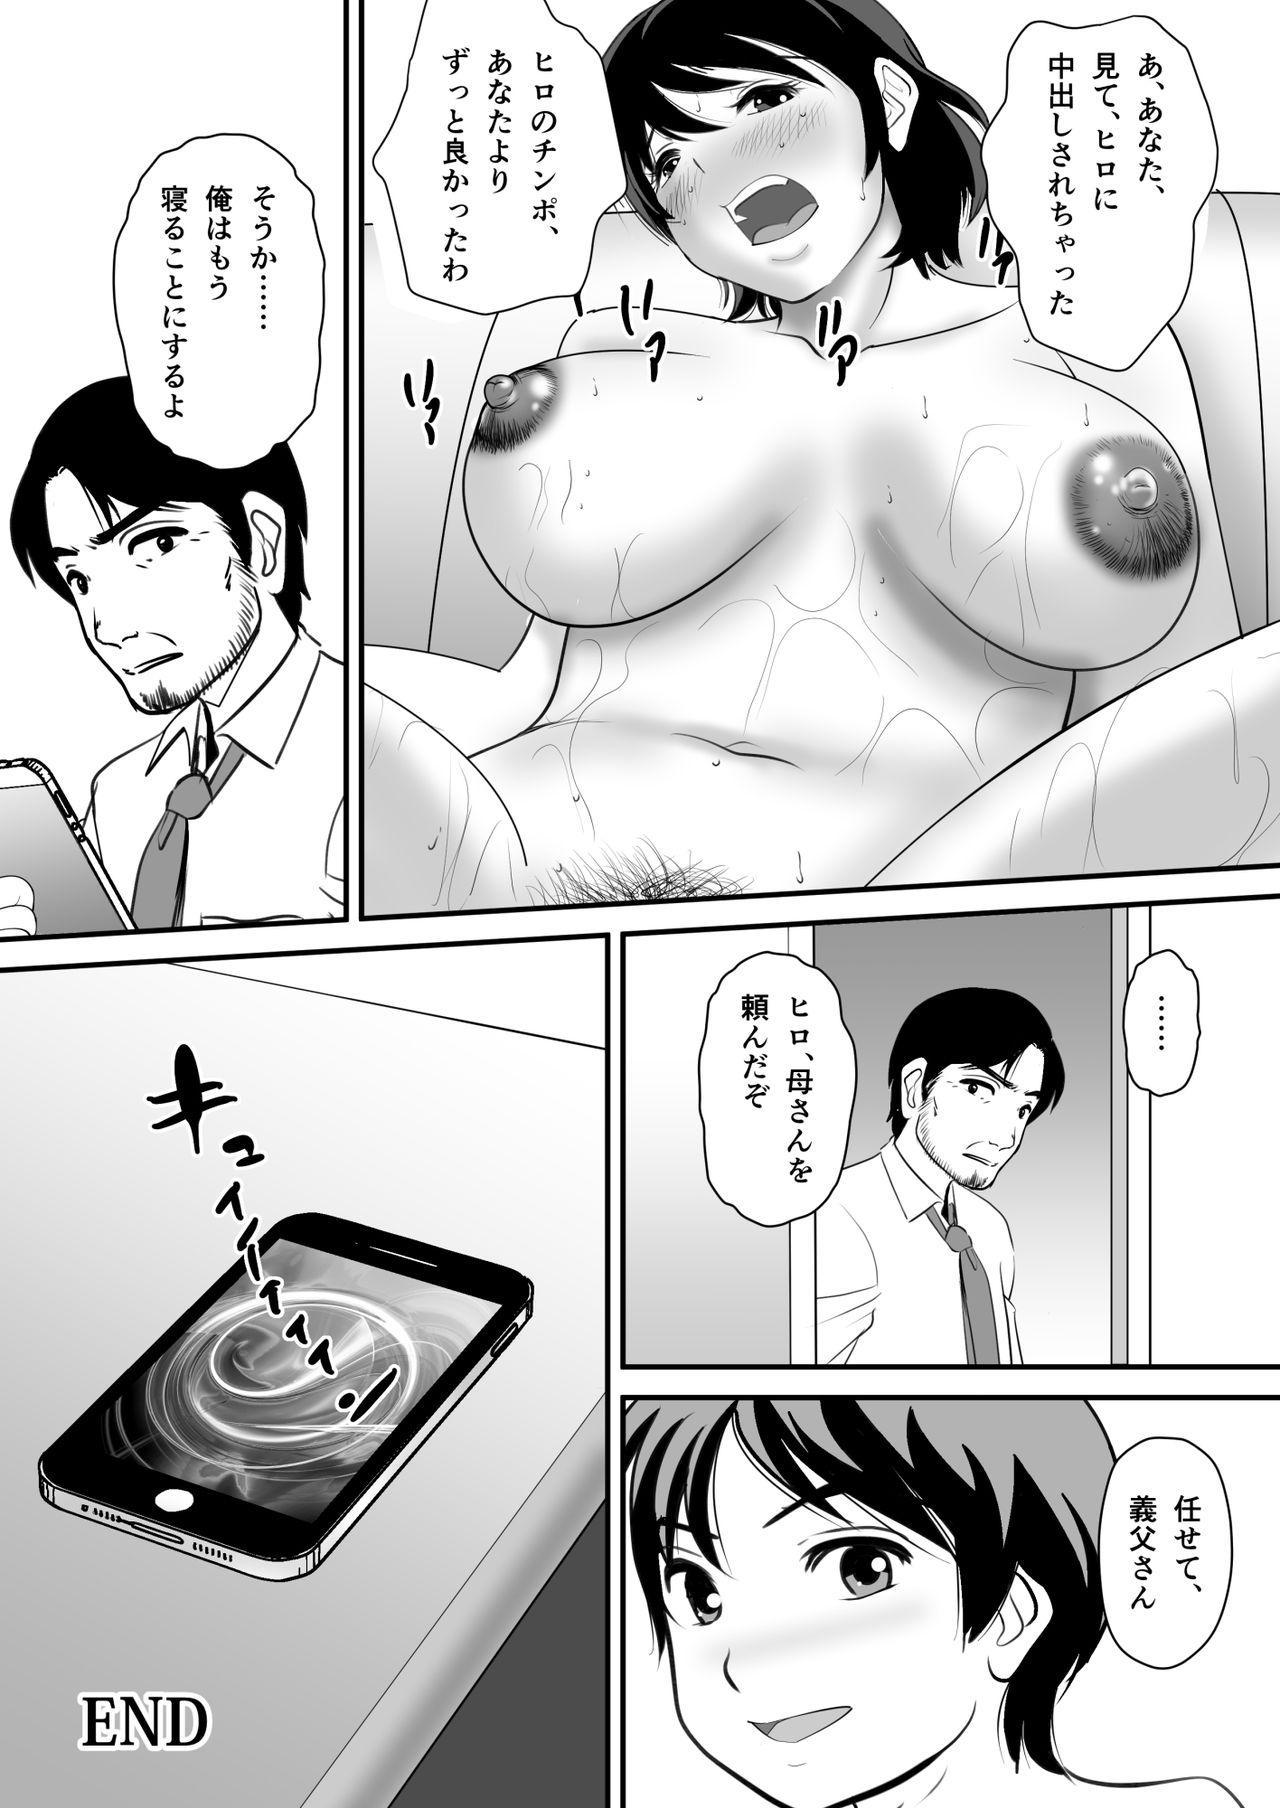 [Milky Club] Netori Appli -Kuso Oyaji kara Kaa-san o Netotta ken- 29